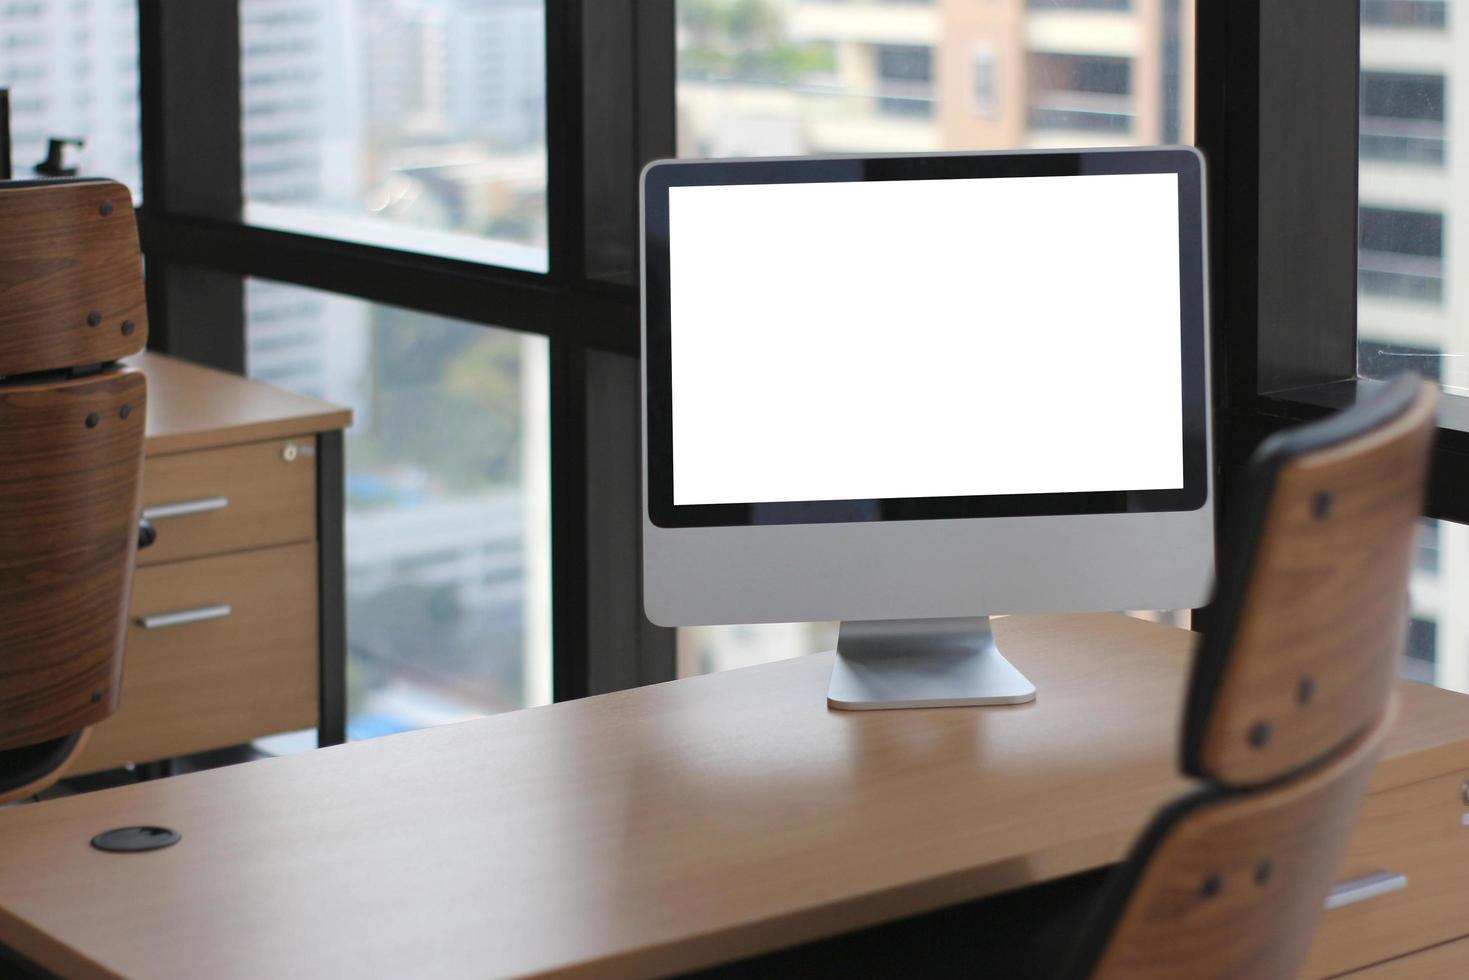 maqueta de computadora de escritorio foto